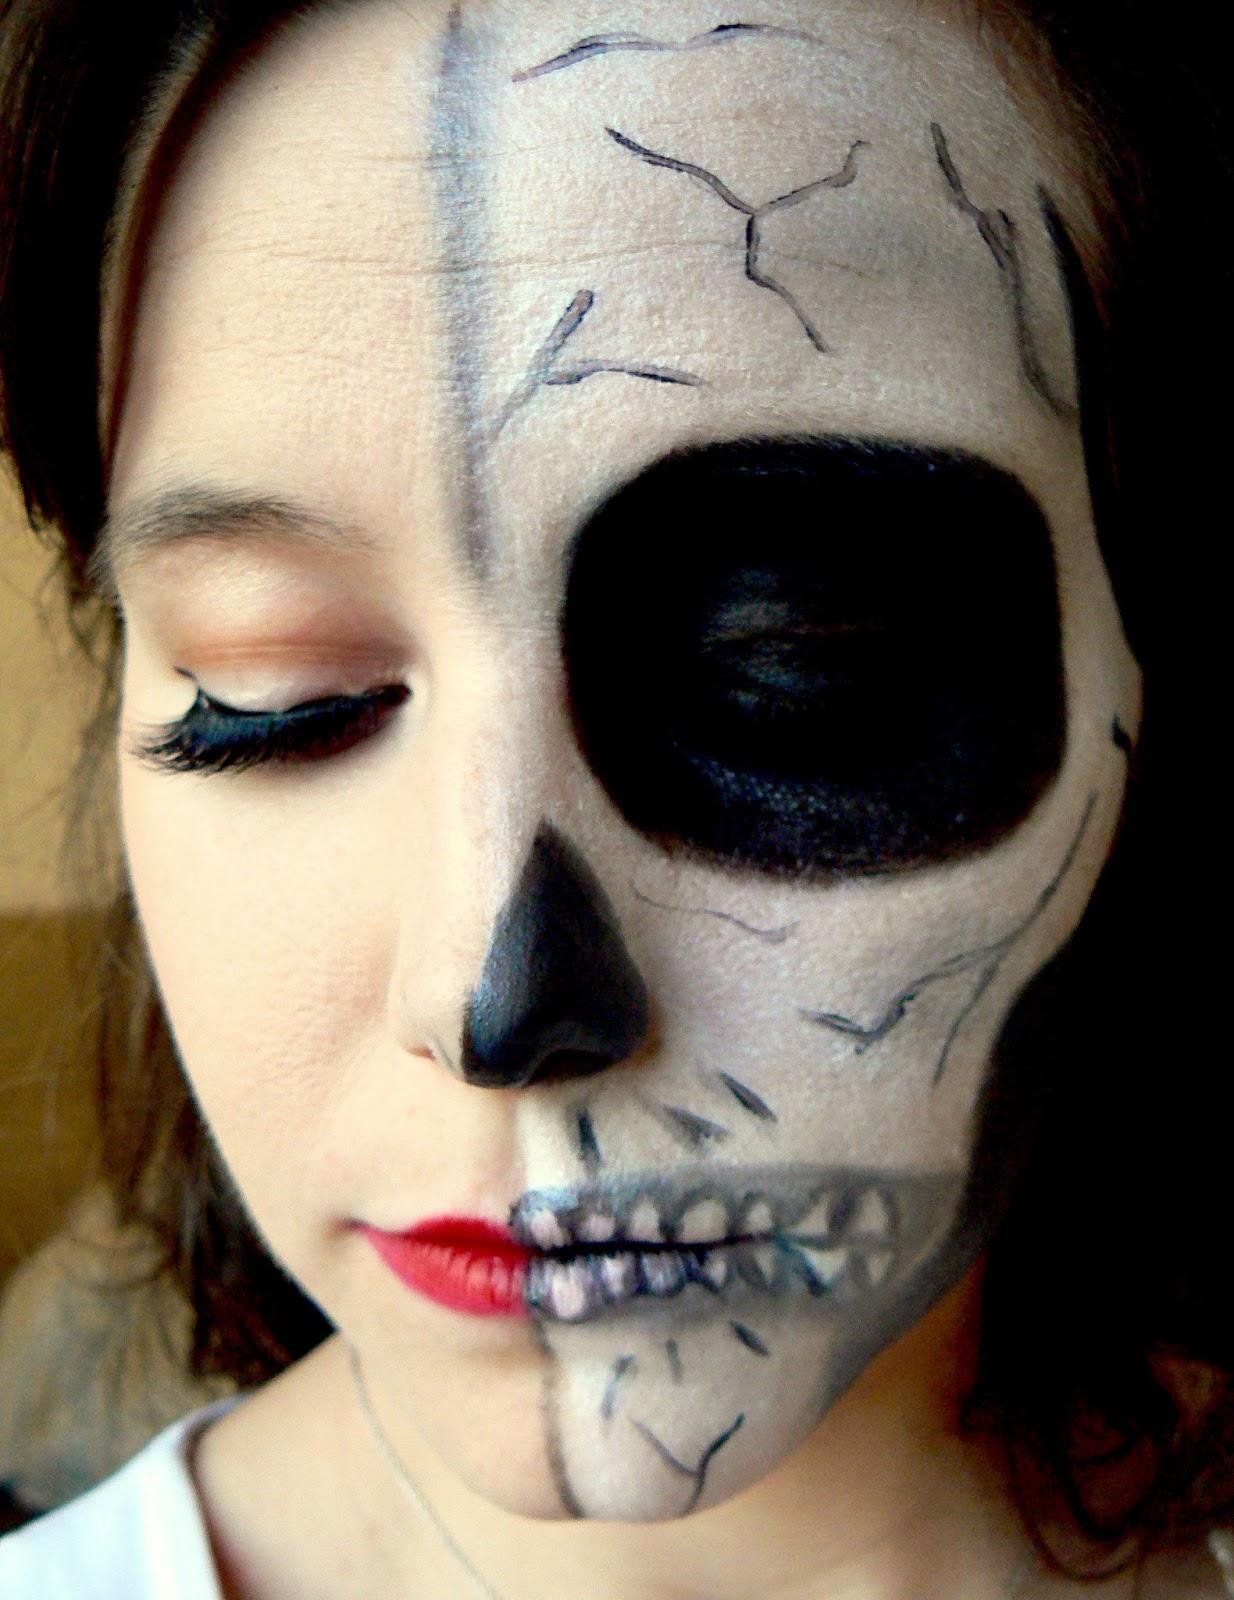 maquillage halloween squelette moitié visage